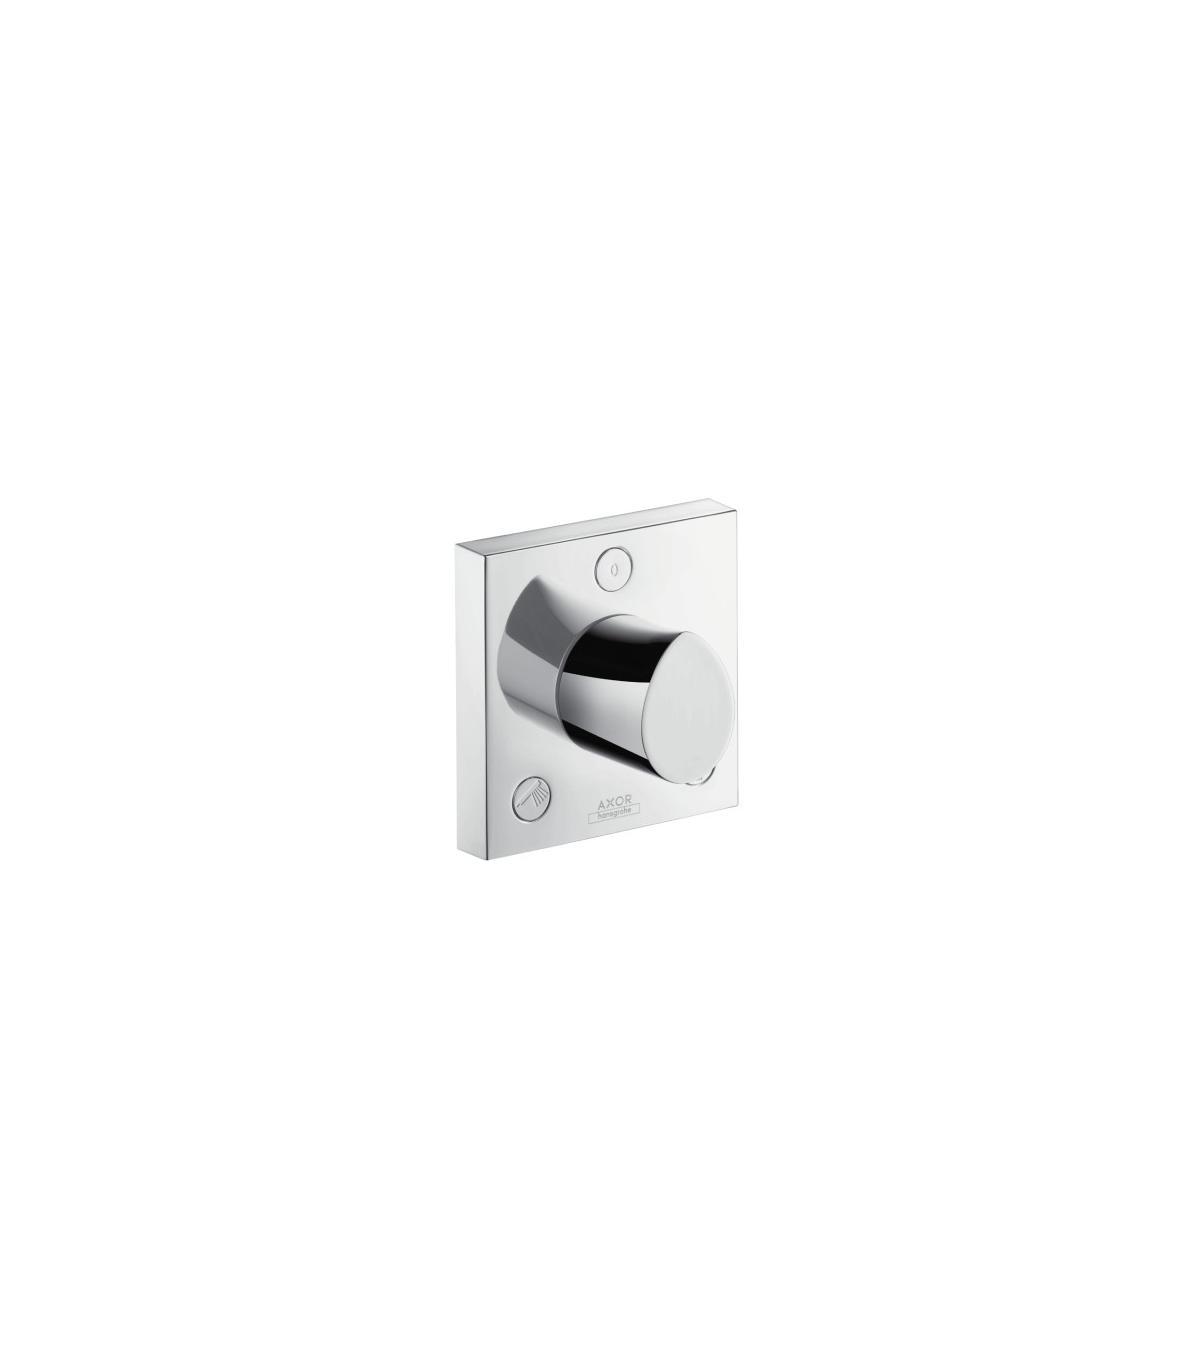 Vaso Wc Filoparete Ideal Standard Tesi Aquablade Con Sedile Slim